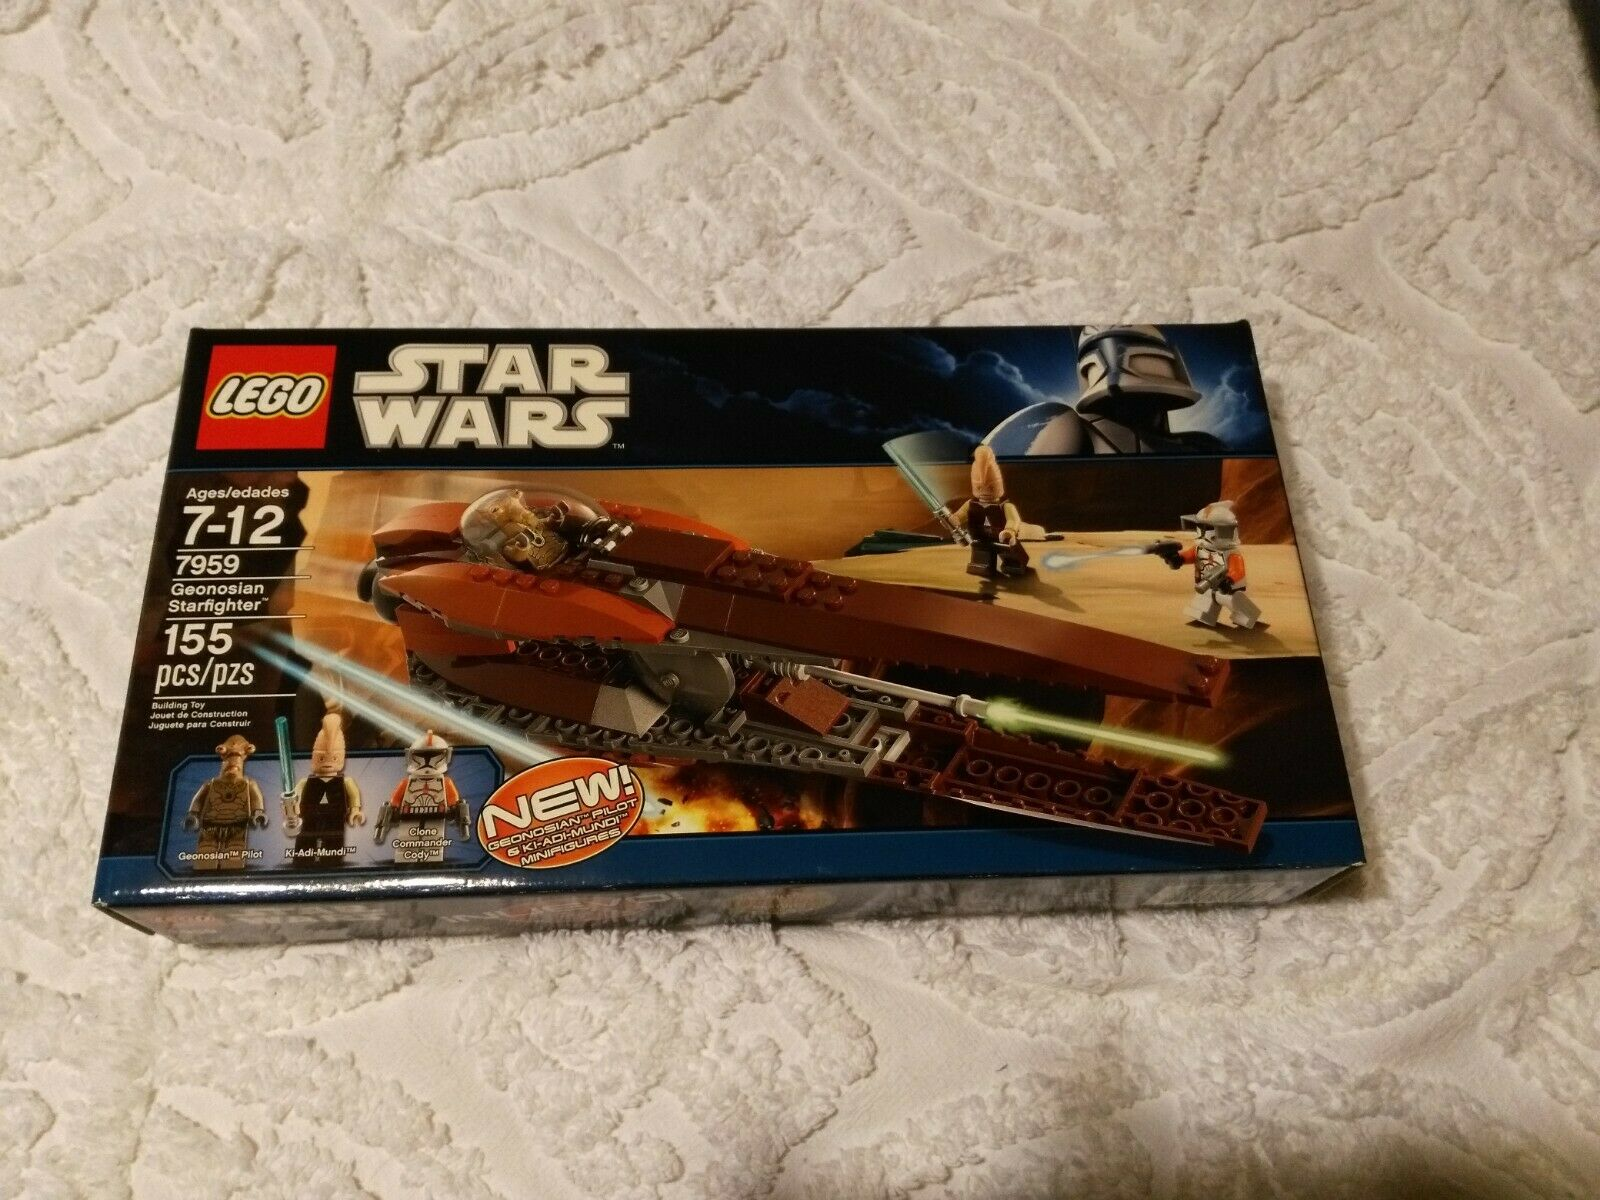 Lego star wars 7959 geonosian starfighter factory sealed nib